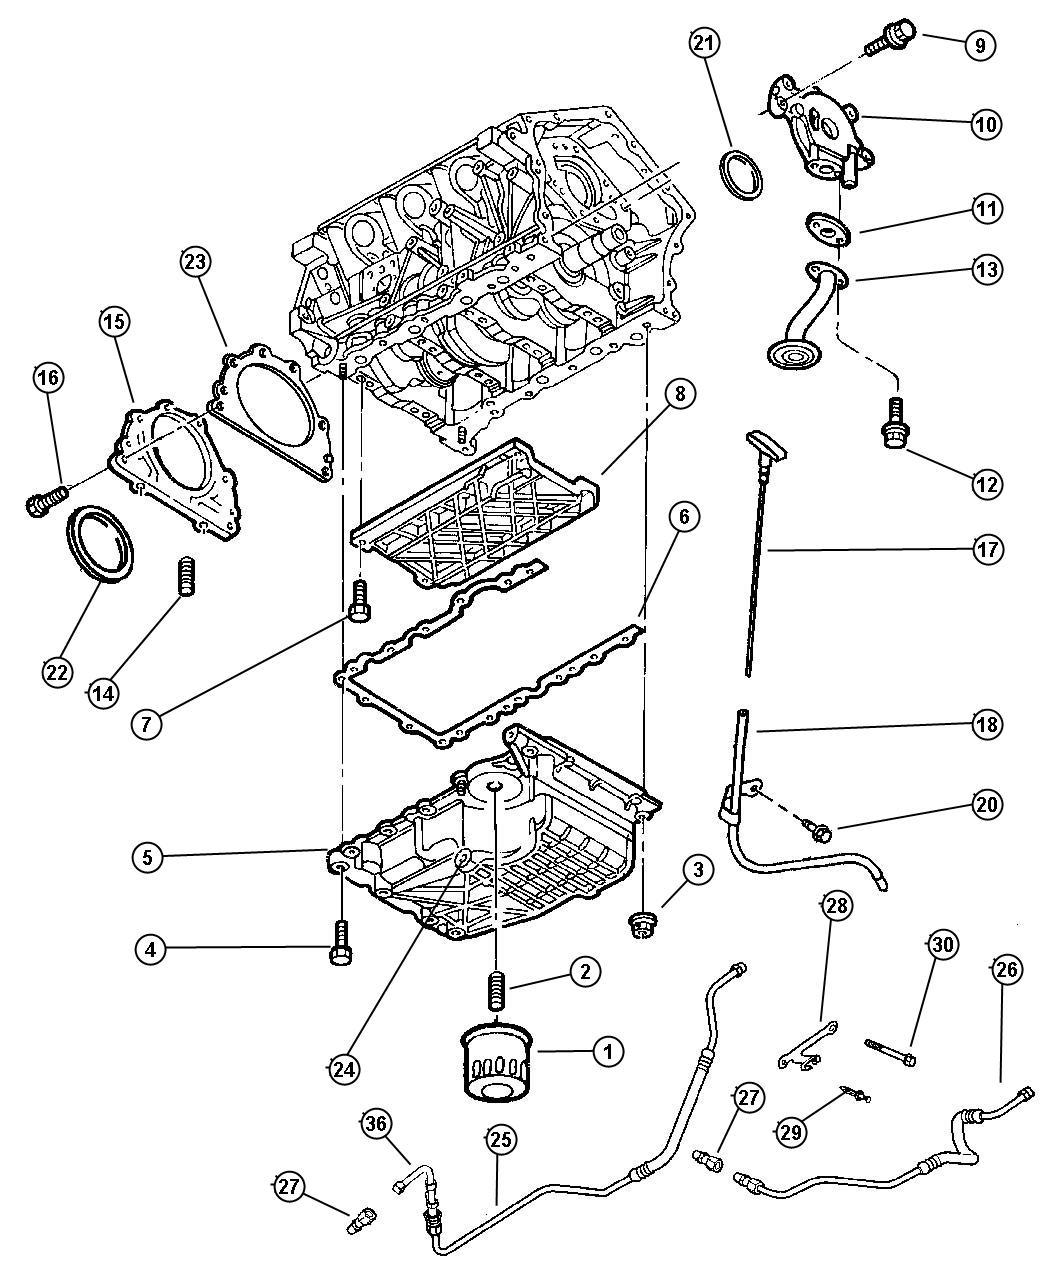 Chrysler Lhs Filter  Engine Oil  Magneti Marelli   Emissions - Mexico    Emissions